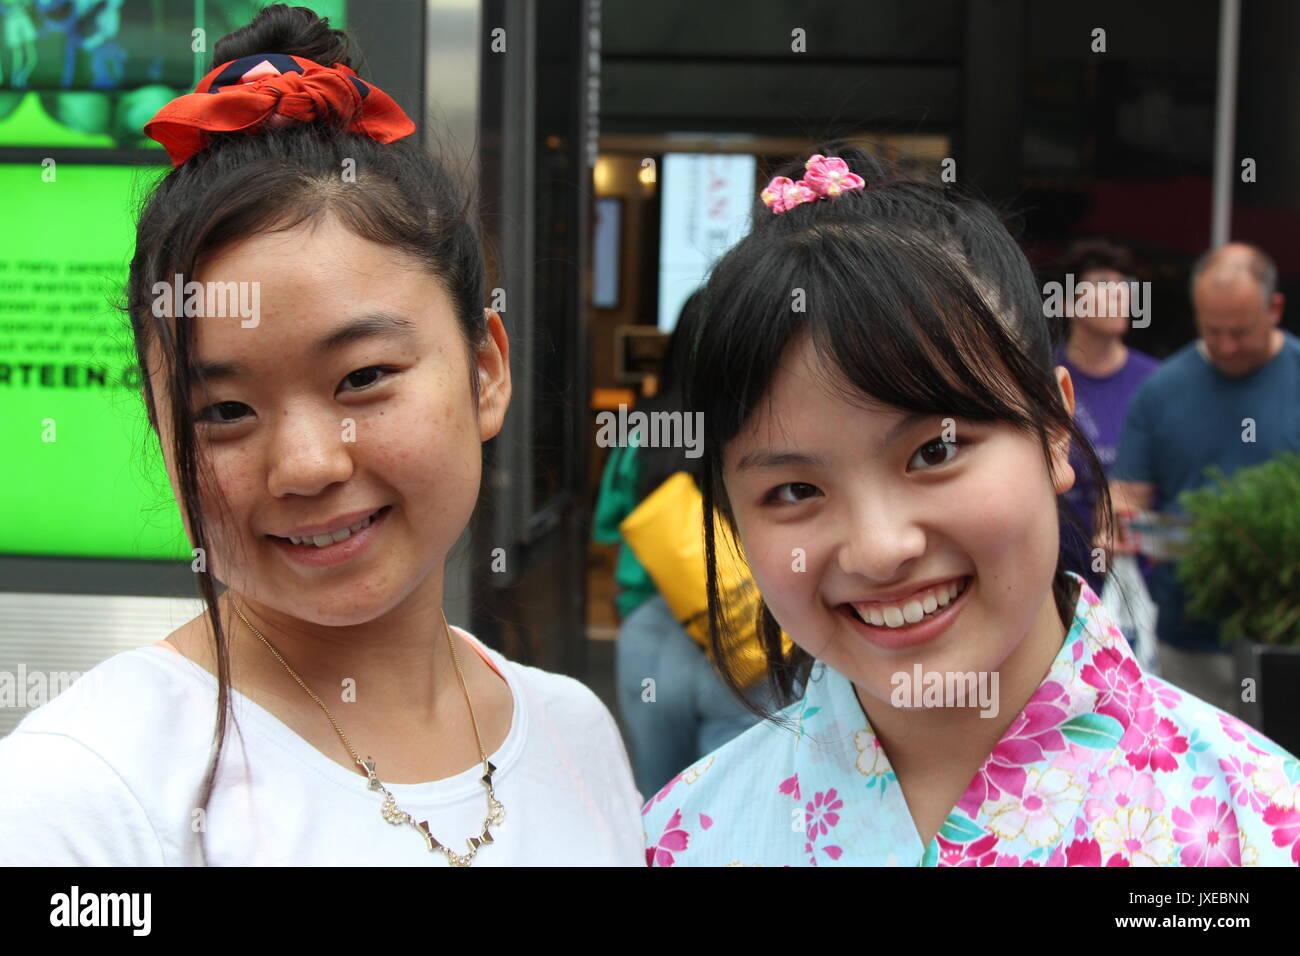 hilary-japan-teen-us-japan-teen-girls-naked